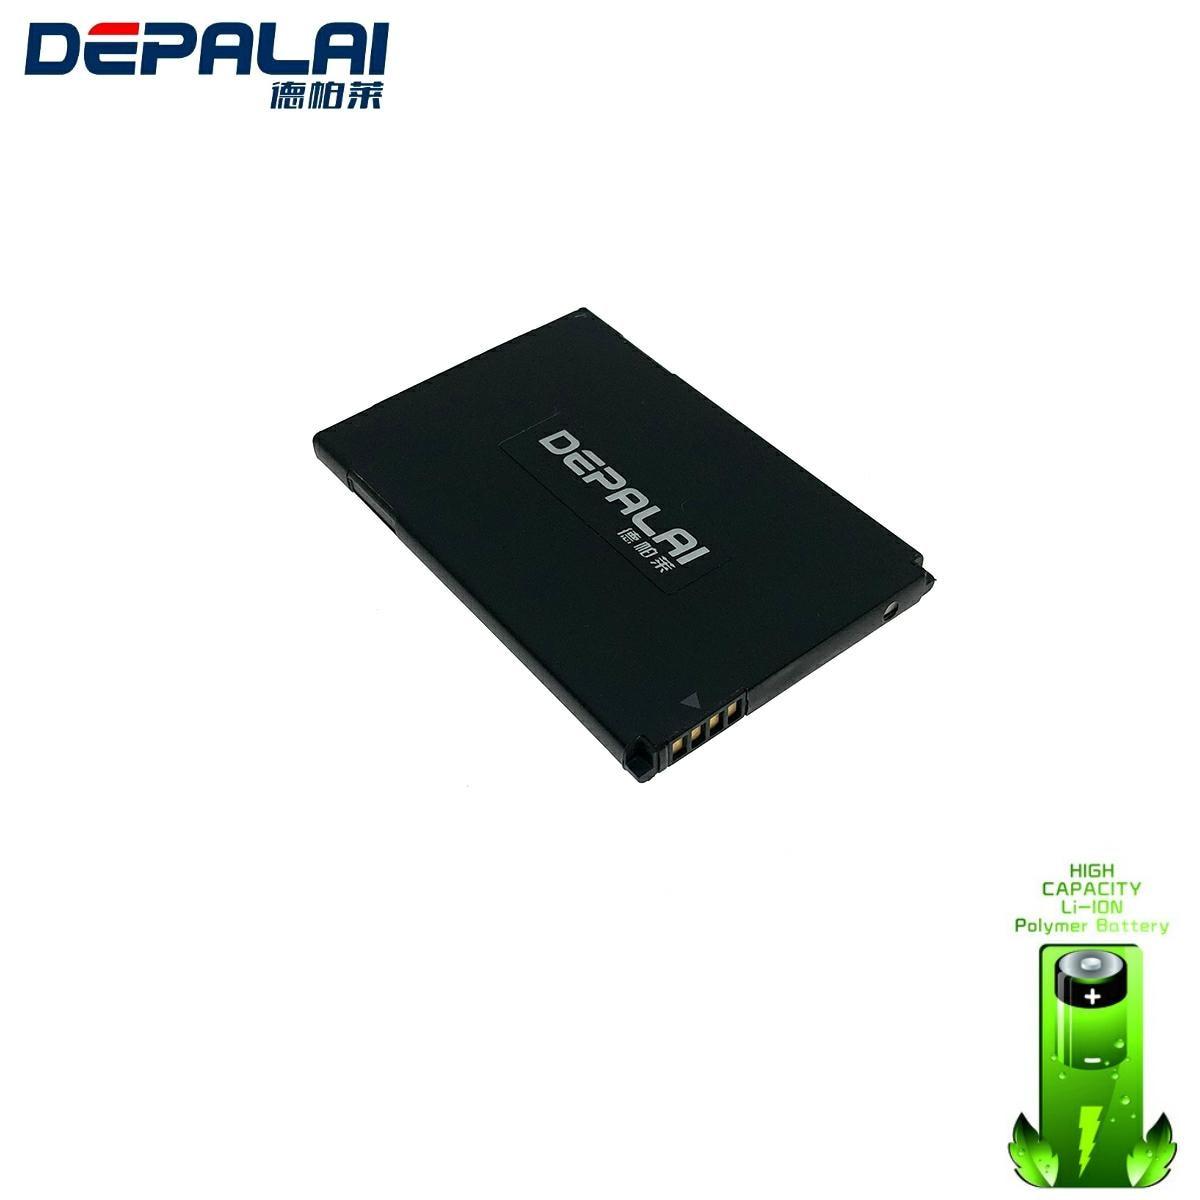 Alta calidad 1300mAh BB96100 batería para HTC Wildfire A3333 A3366 A3360 A3380 T-Mobile G2 G8 G6 A6363 A6390